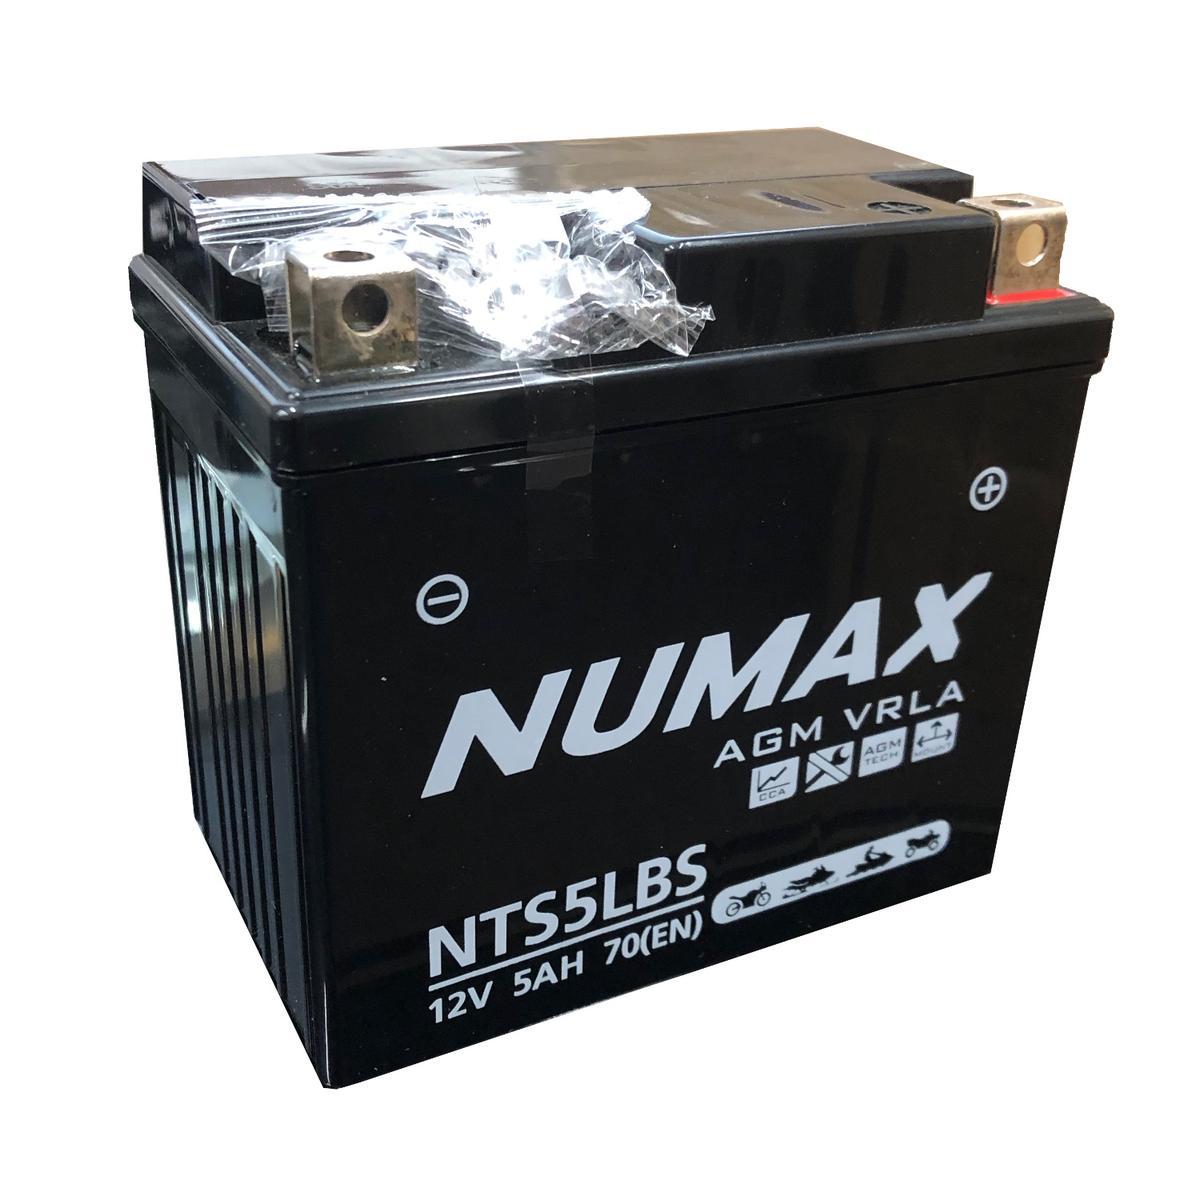 Numax 12v NTS5LBS Motorbike Motorcycle Bike Battery Replaces YTX5-LBS YTX5L-4